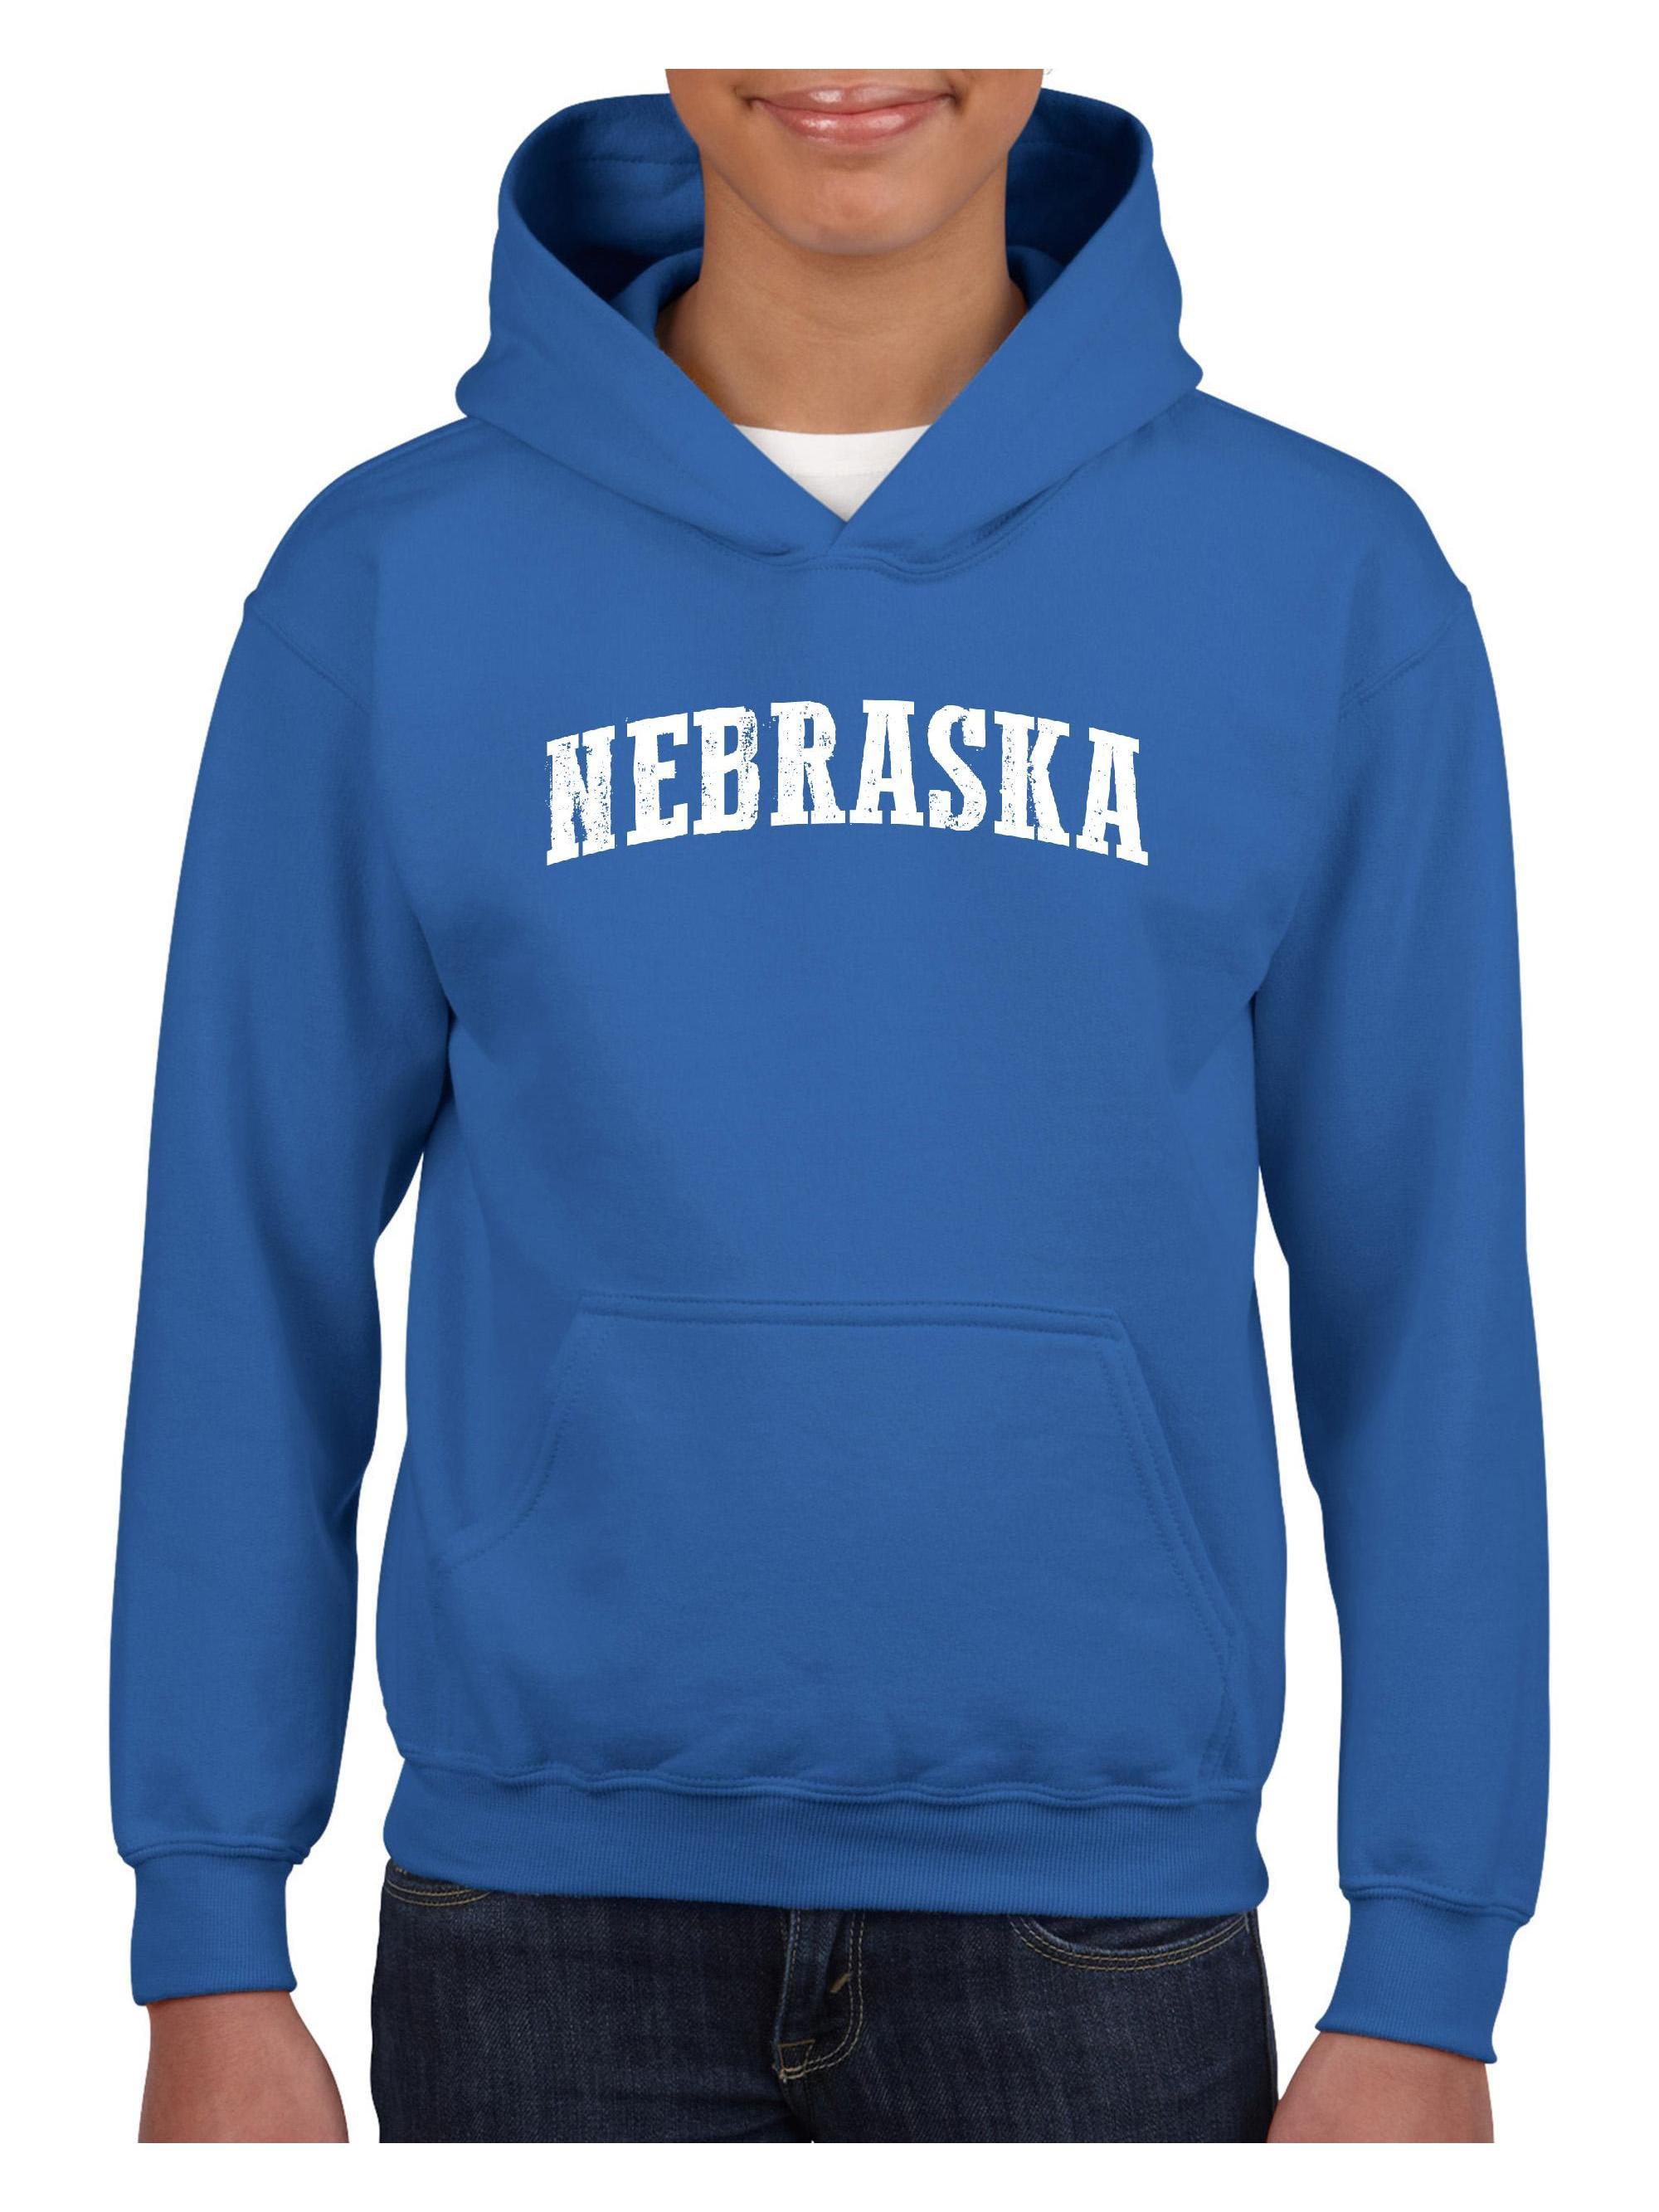 Nebraska State Flag Made in Nebraska Omaha Unisex Hoodie For Girls and Boys Youth Sweatshirt